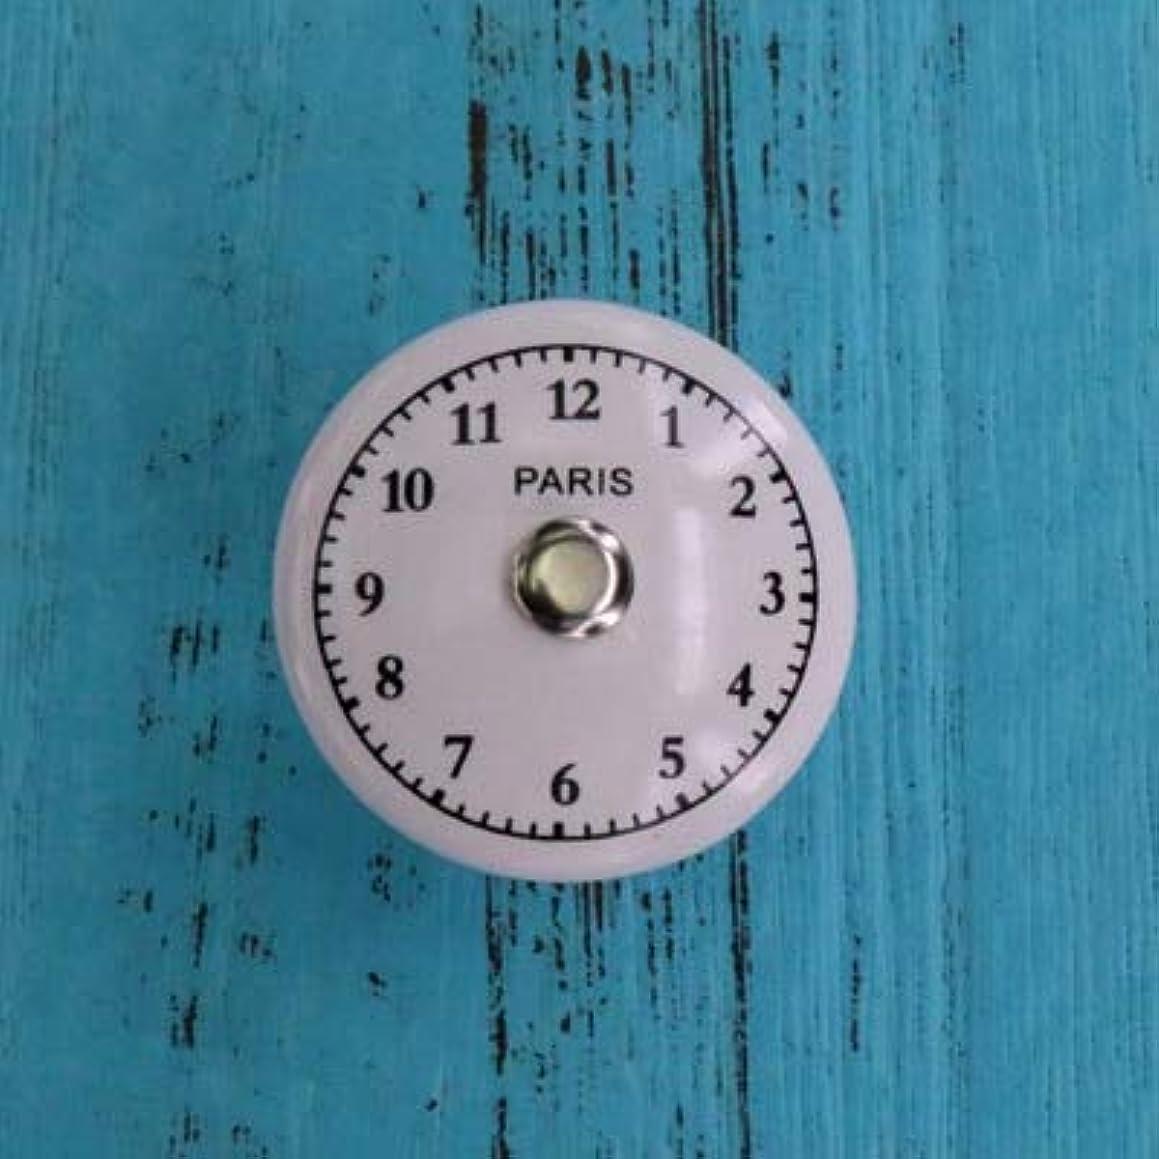 1x Round Dresser Knobs White Ceramic Drawer Pulls for Kids' Room Clock Door Cabinet Handles Funiture Hardware - (Color: B)